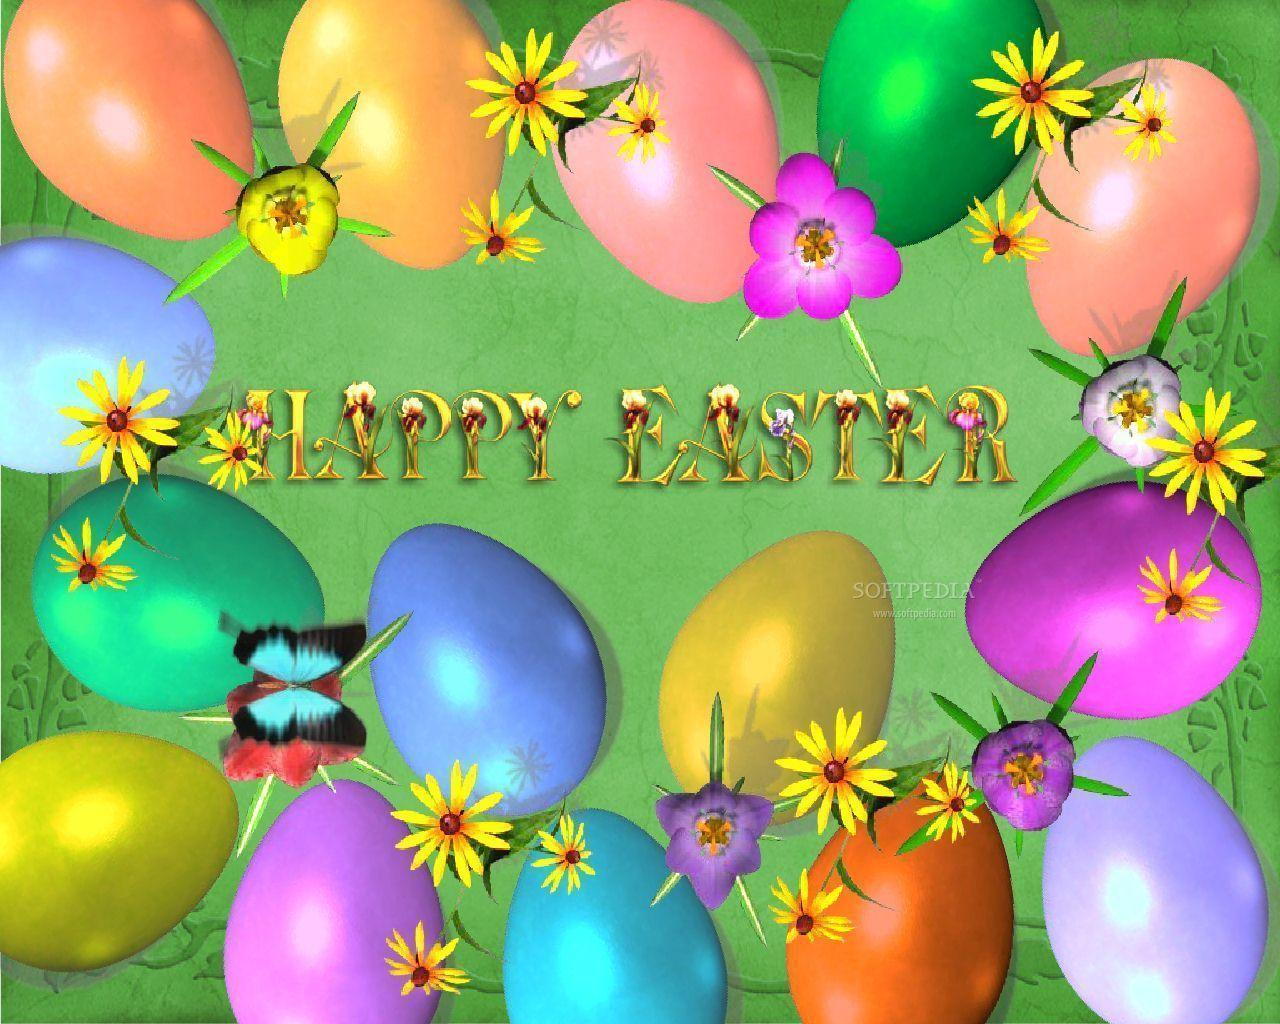 Happy Easter Backgrounds For Desktop - Wallpaper Cave